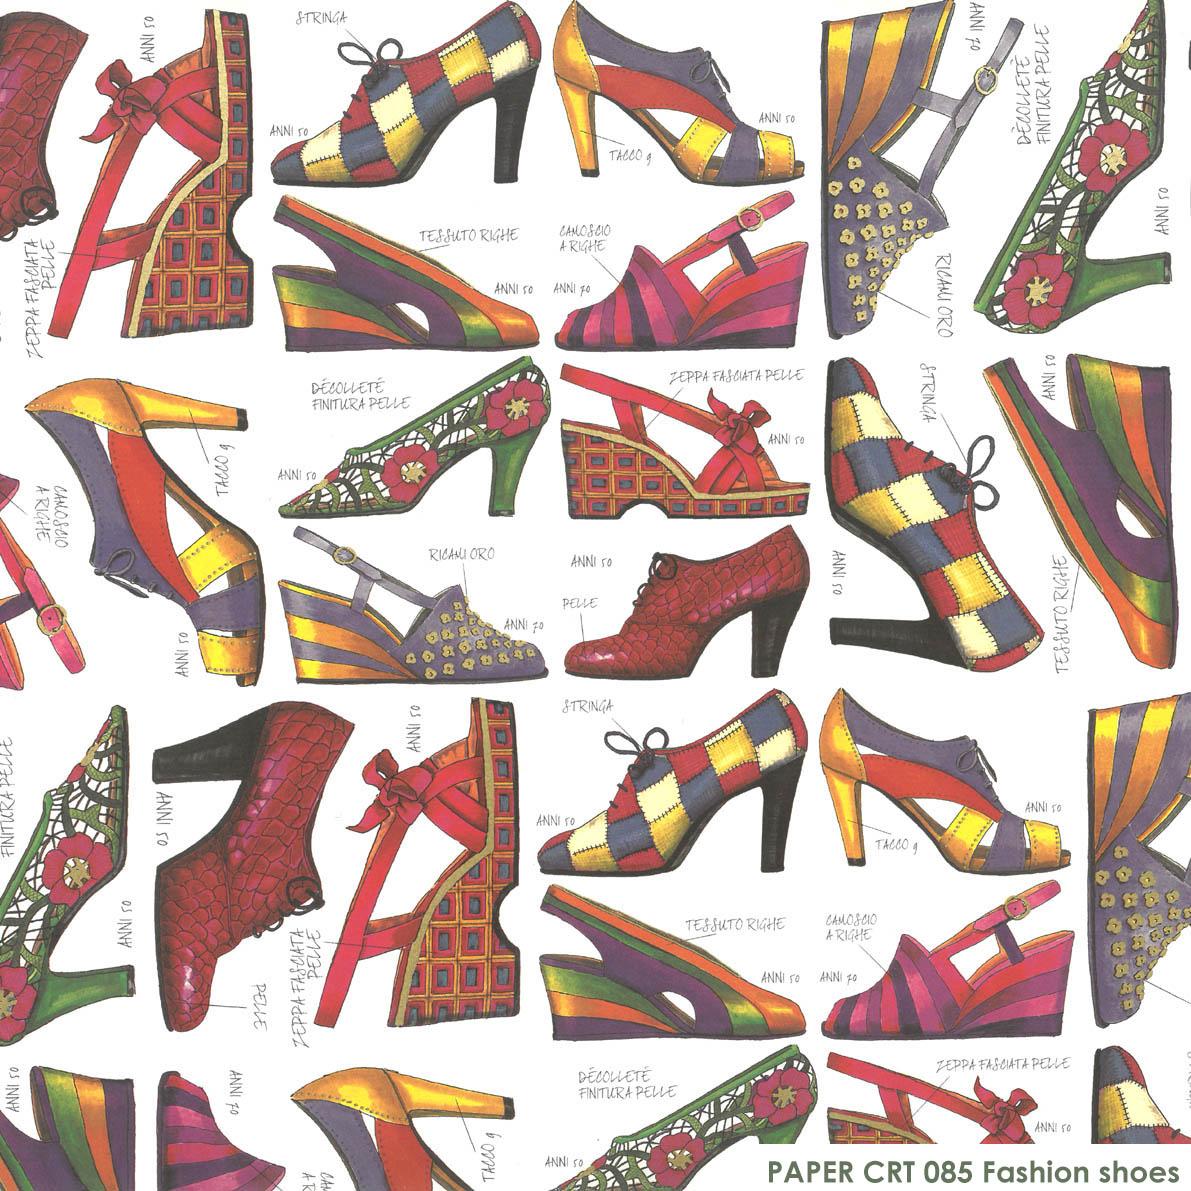 CRT 085 Fashion shoes